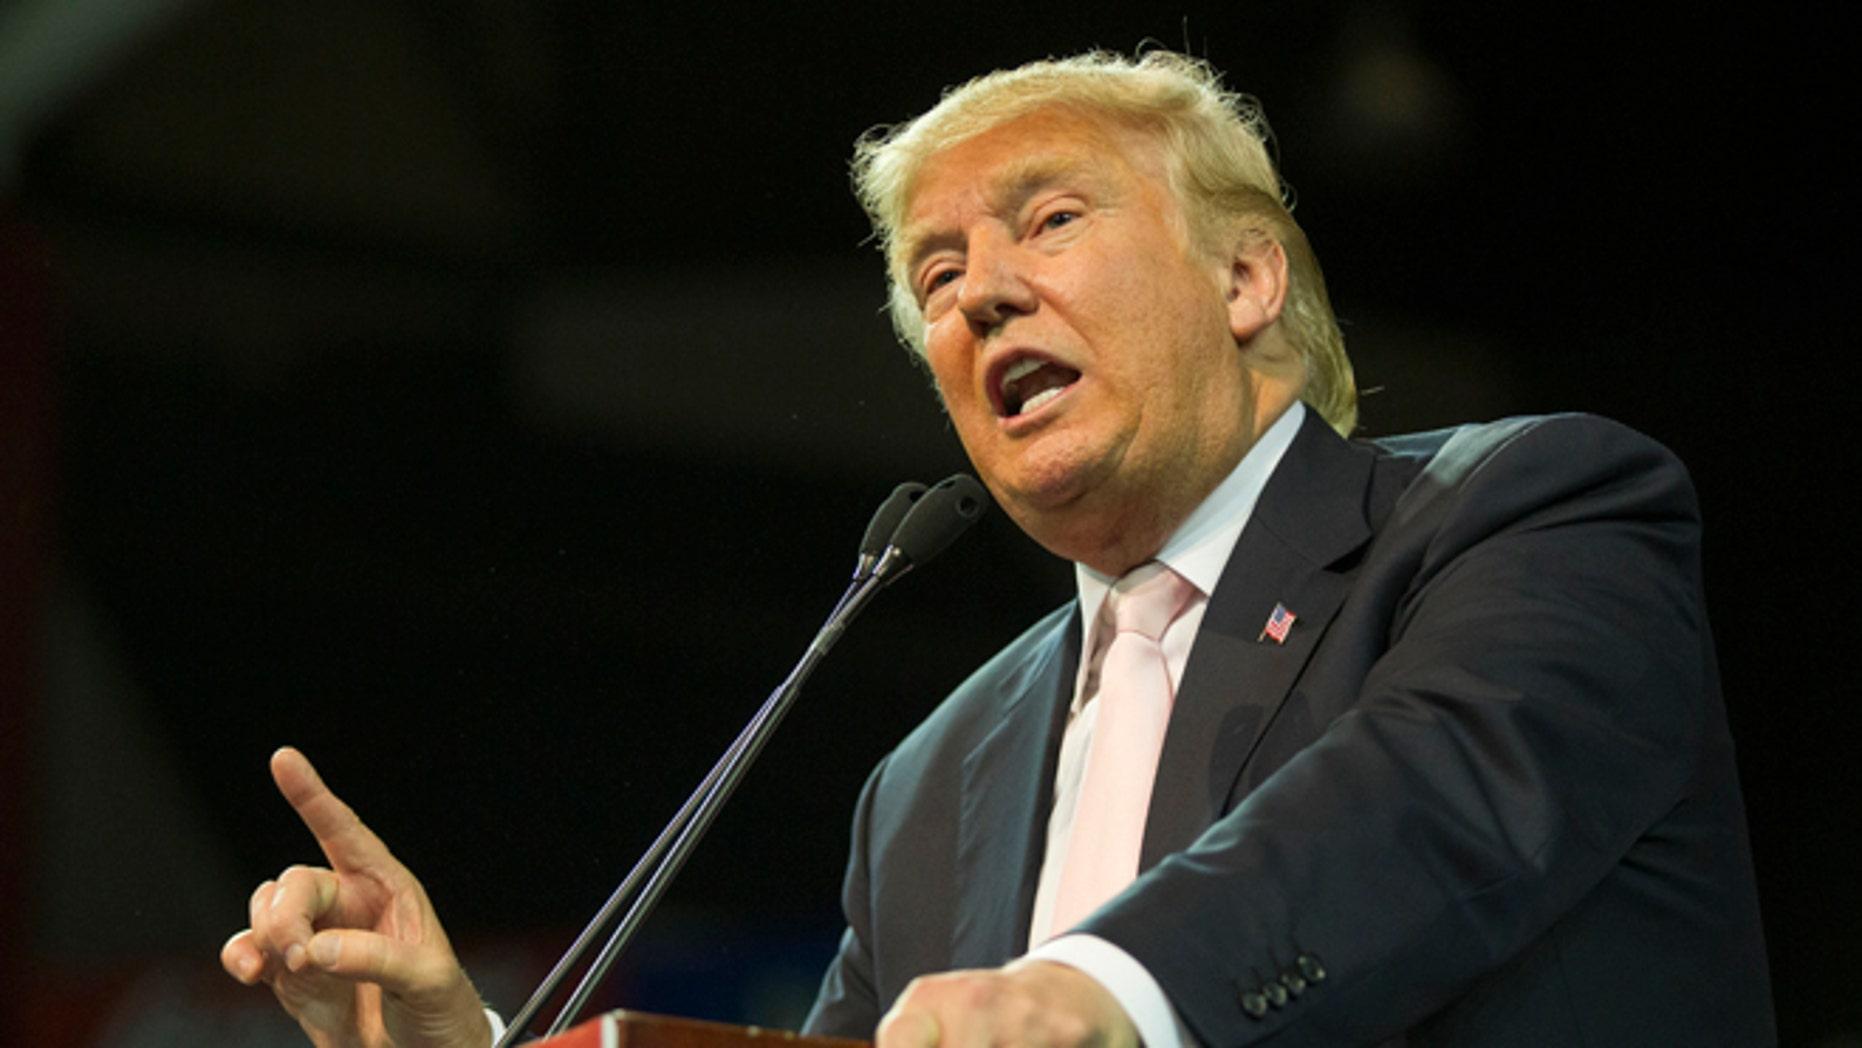 GOP presidential candidate Donald Trump on February 29, 2016 in Valdosta, Georgia.